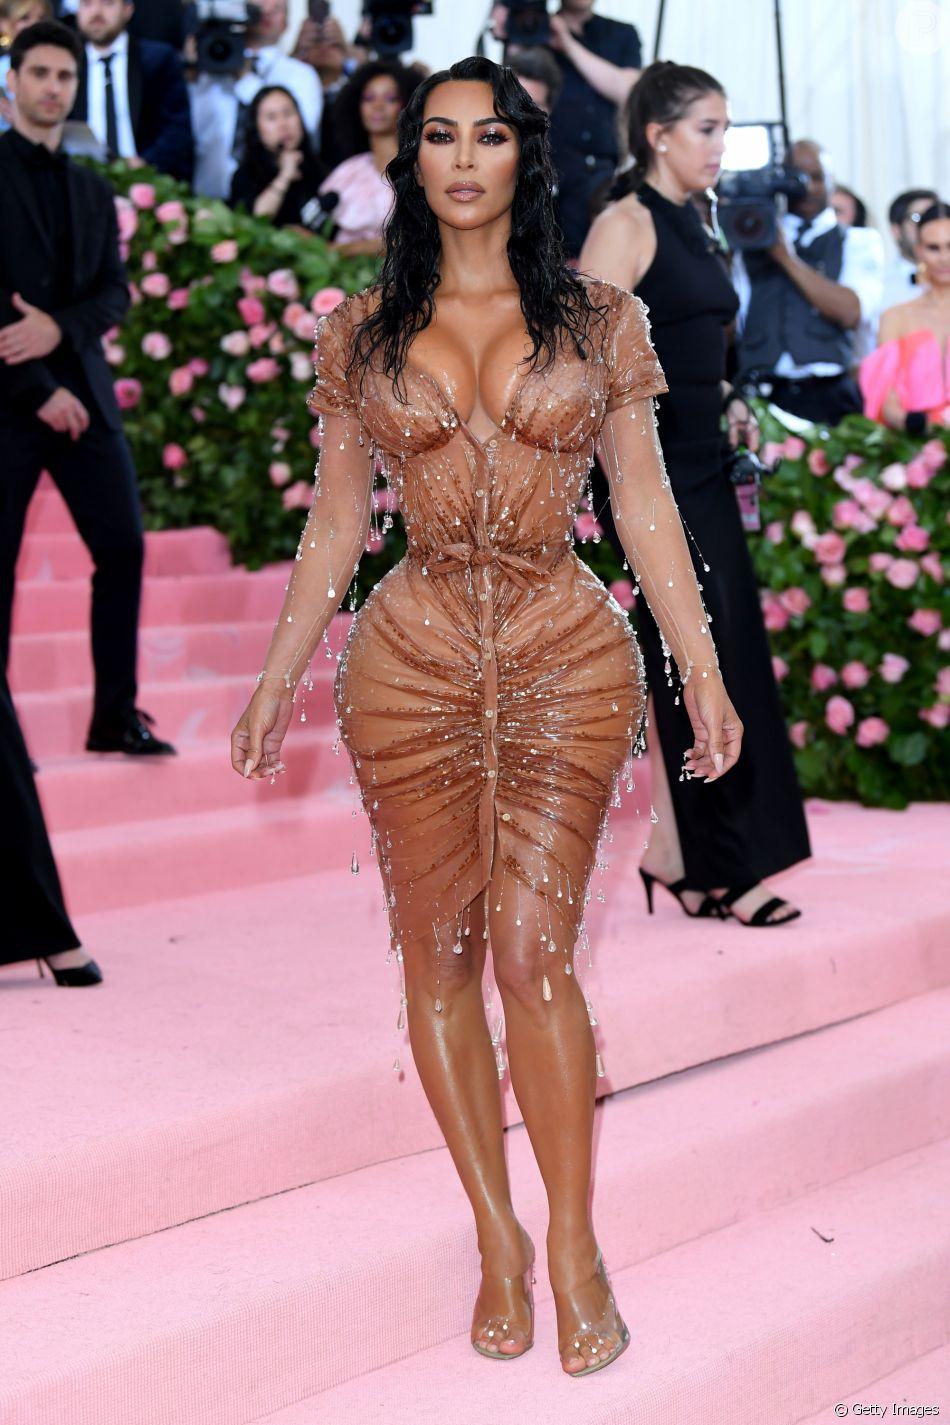 Veja o look completo de Kim Kardashian no baile de gala no